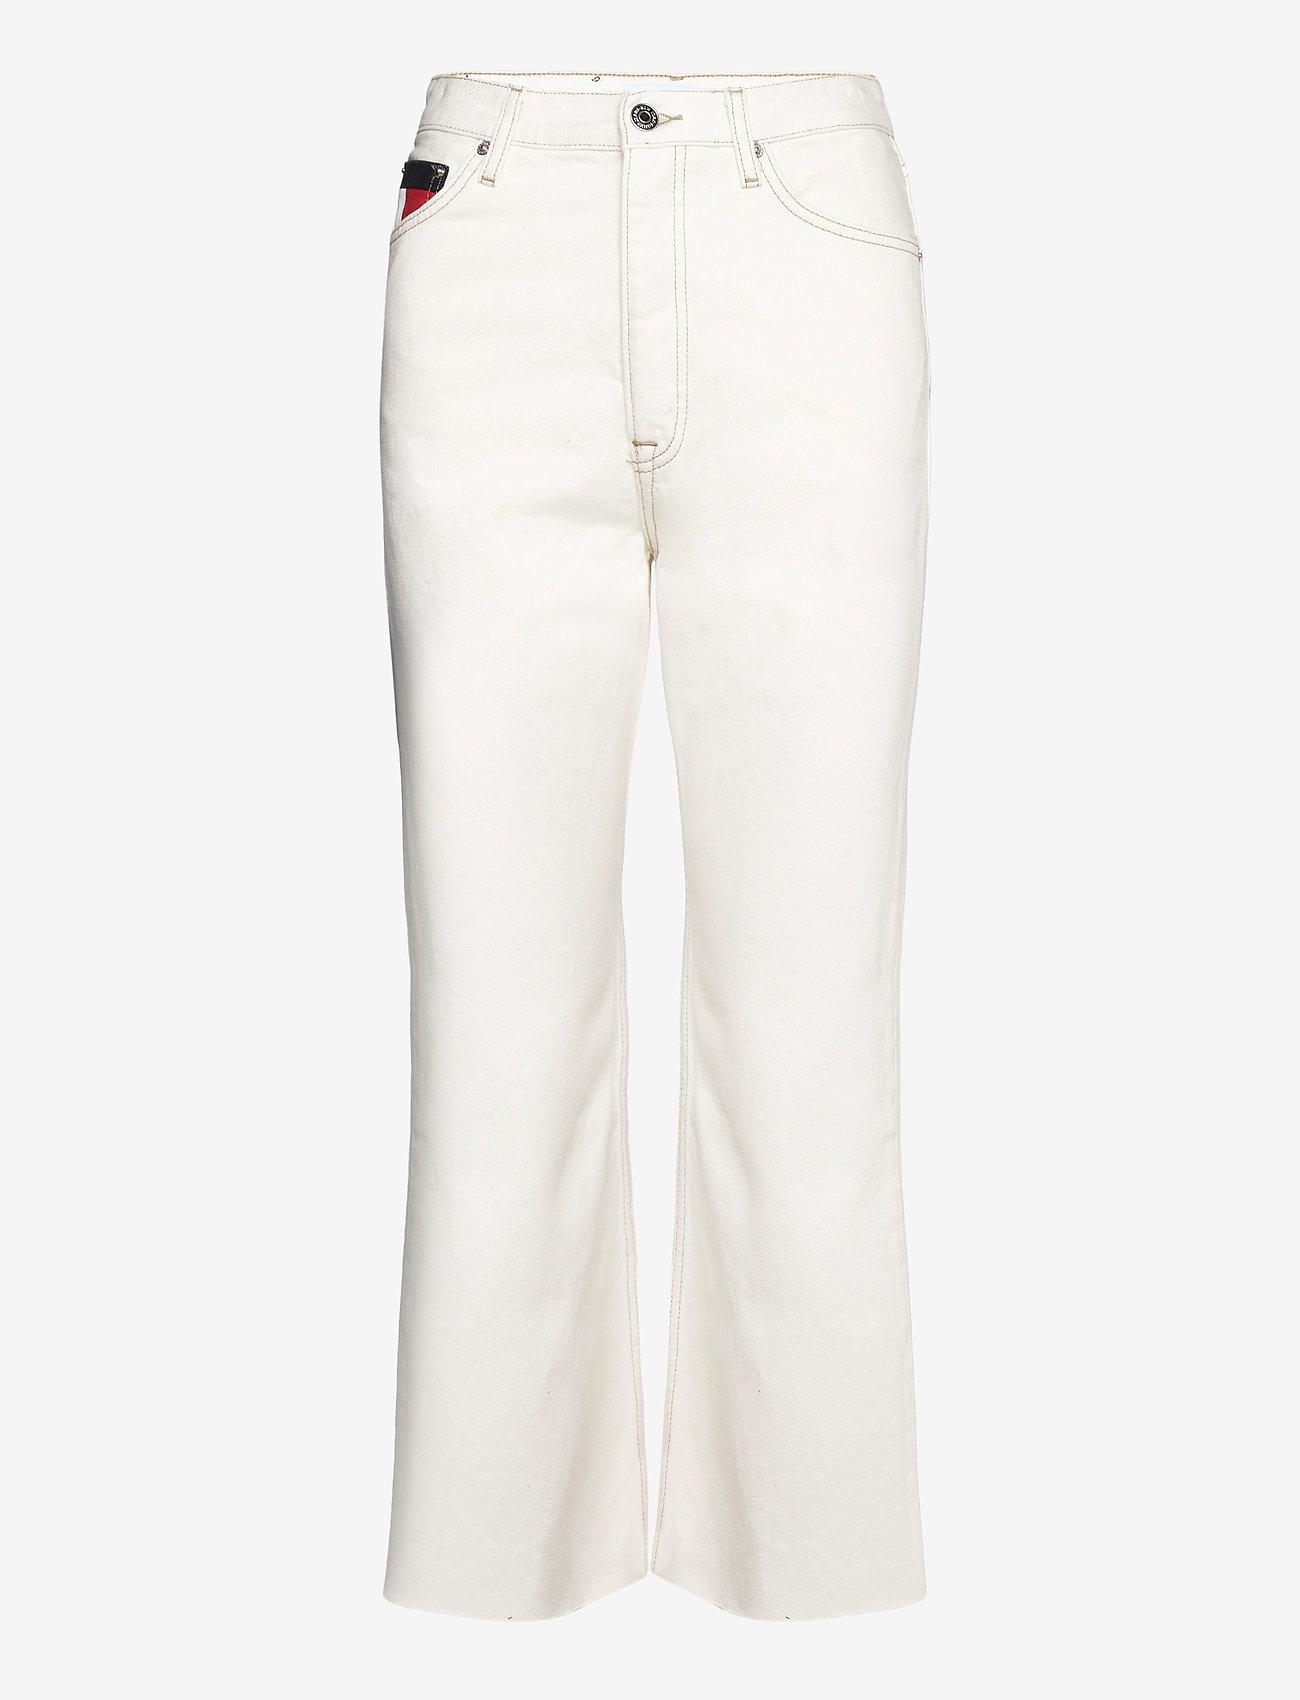 Tommy Jeans - HARPER HR FLARE ANKLE BF SSPWR - schlaghosen - save sp white rgd - 0